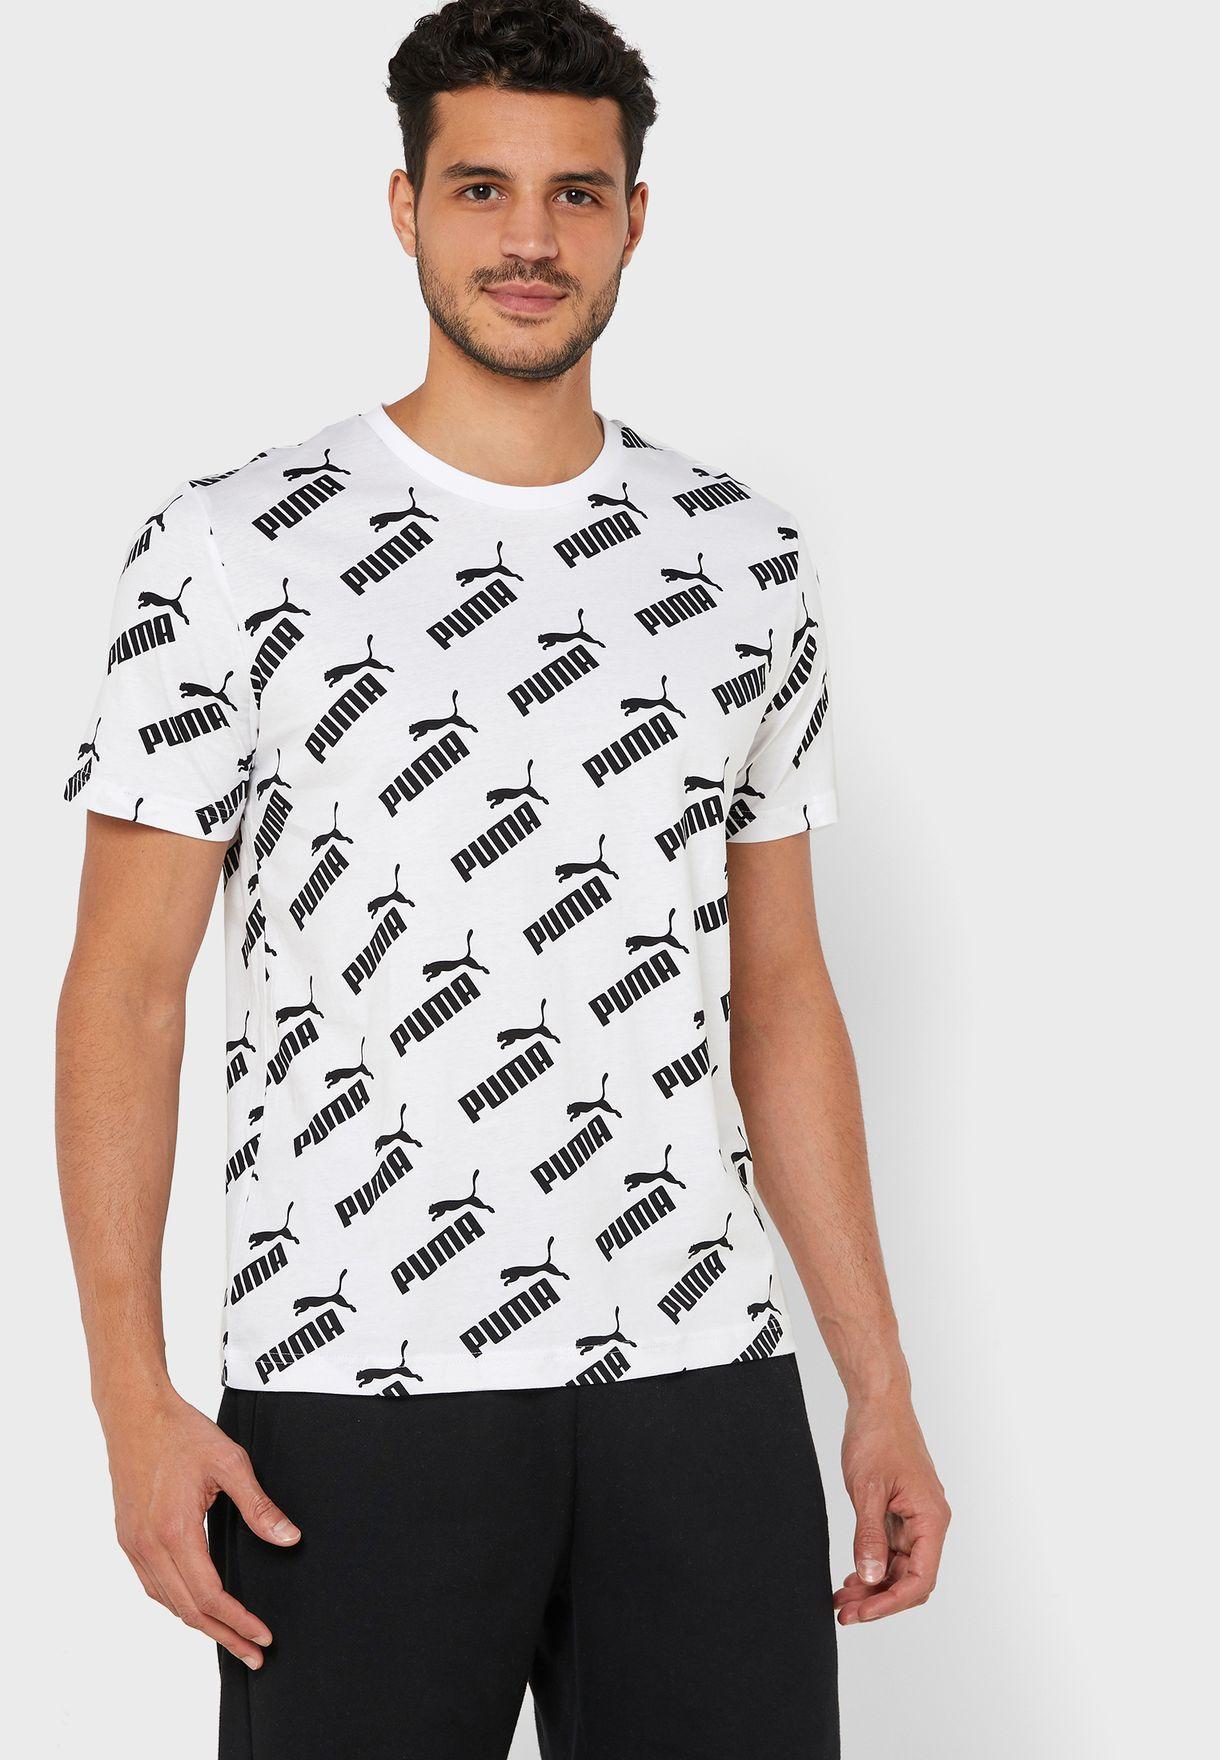 Amplified AOP T-Shirt